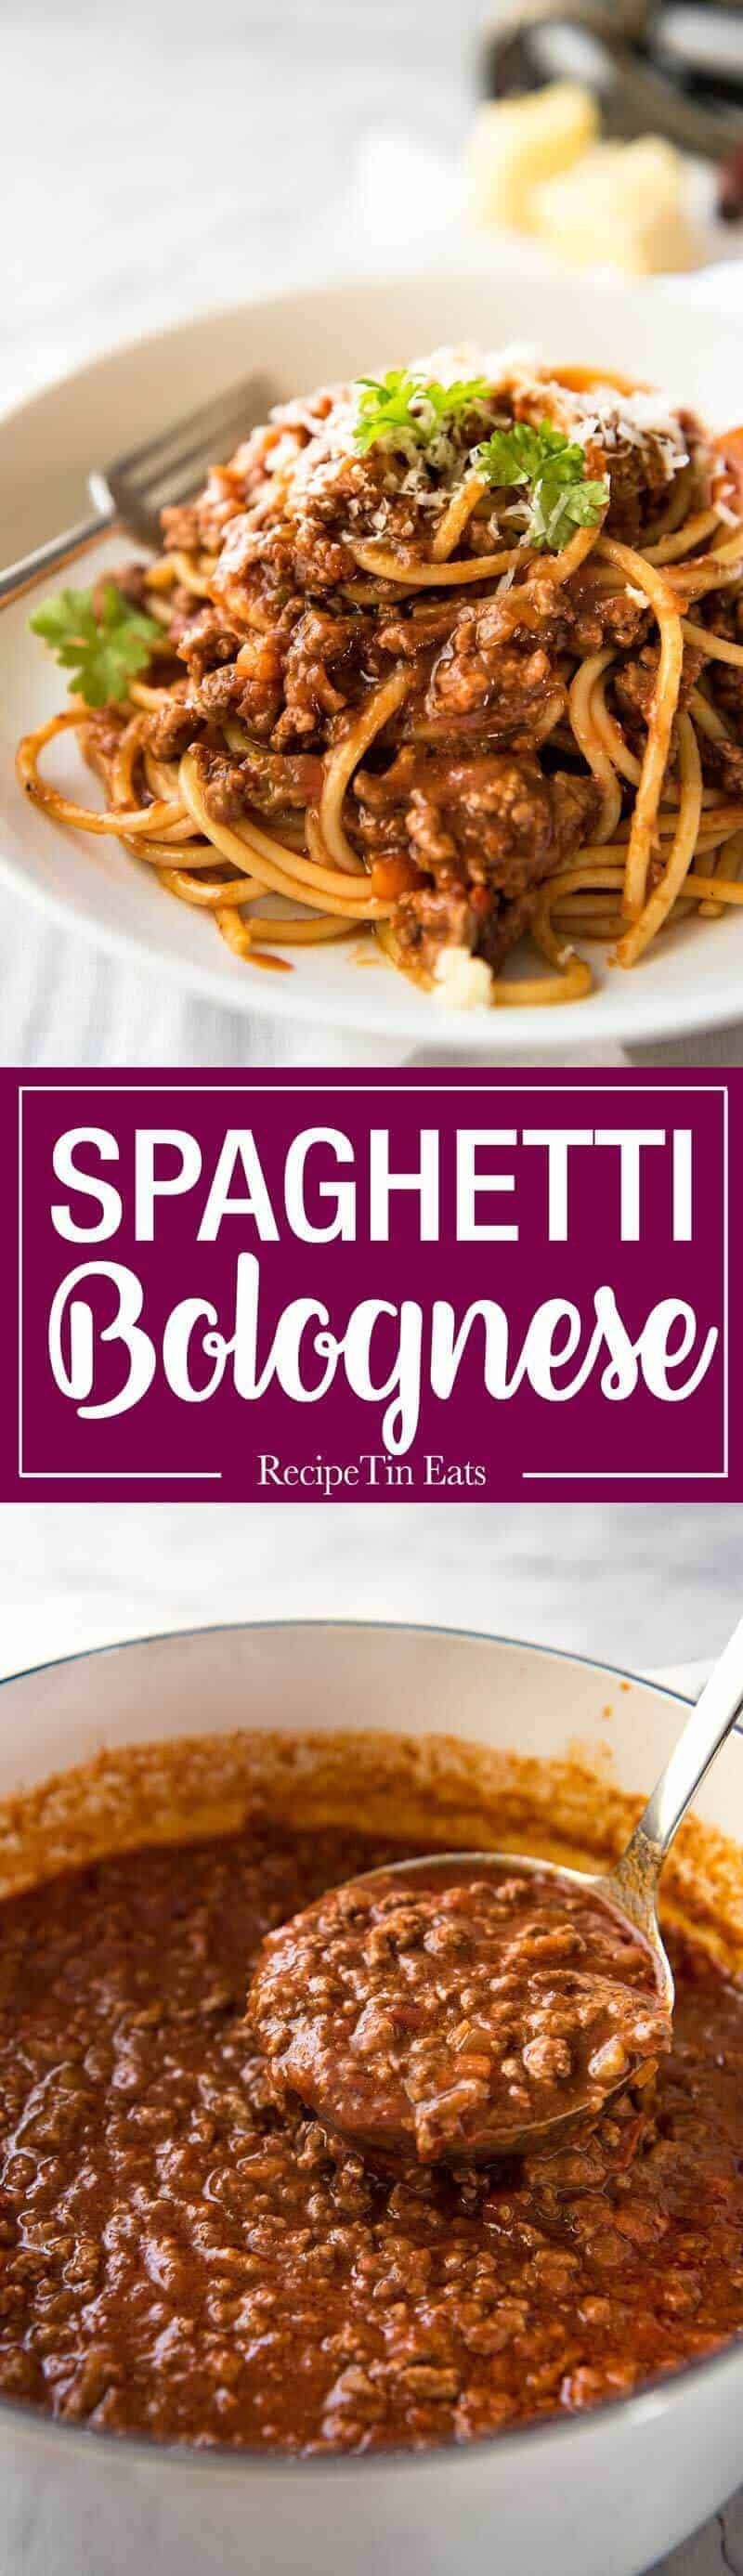 Spaghetti Bolognaise  RecetteTin Mange Spaghetti Bolognaise  RecetteTin Mange